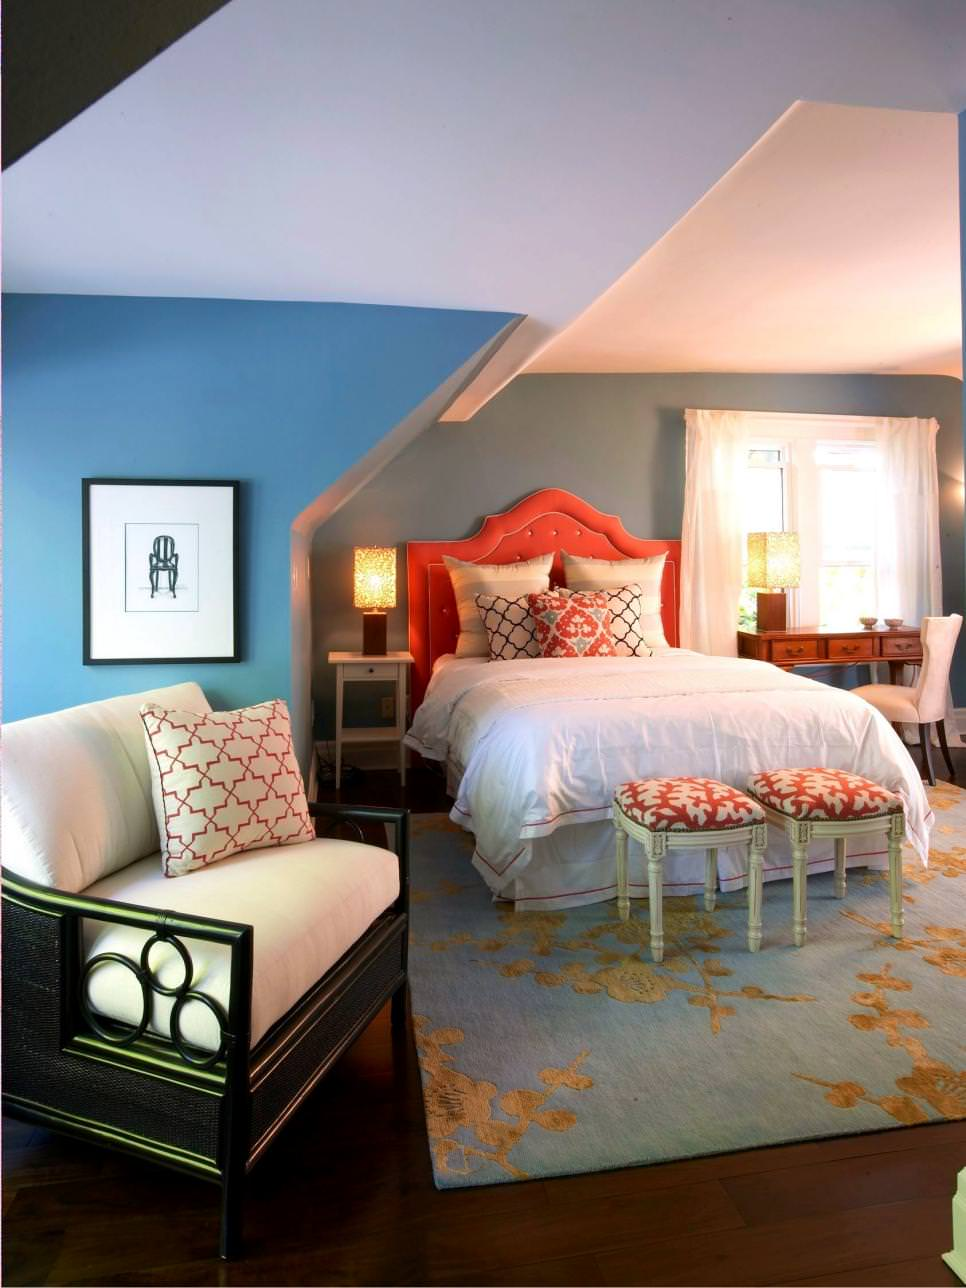 23+ Decorated Attic Home Designs, Decorating Ideas ... on Teenage:rfnoincytf8= Room Designs  id=39296